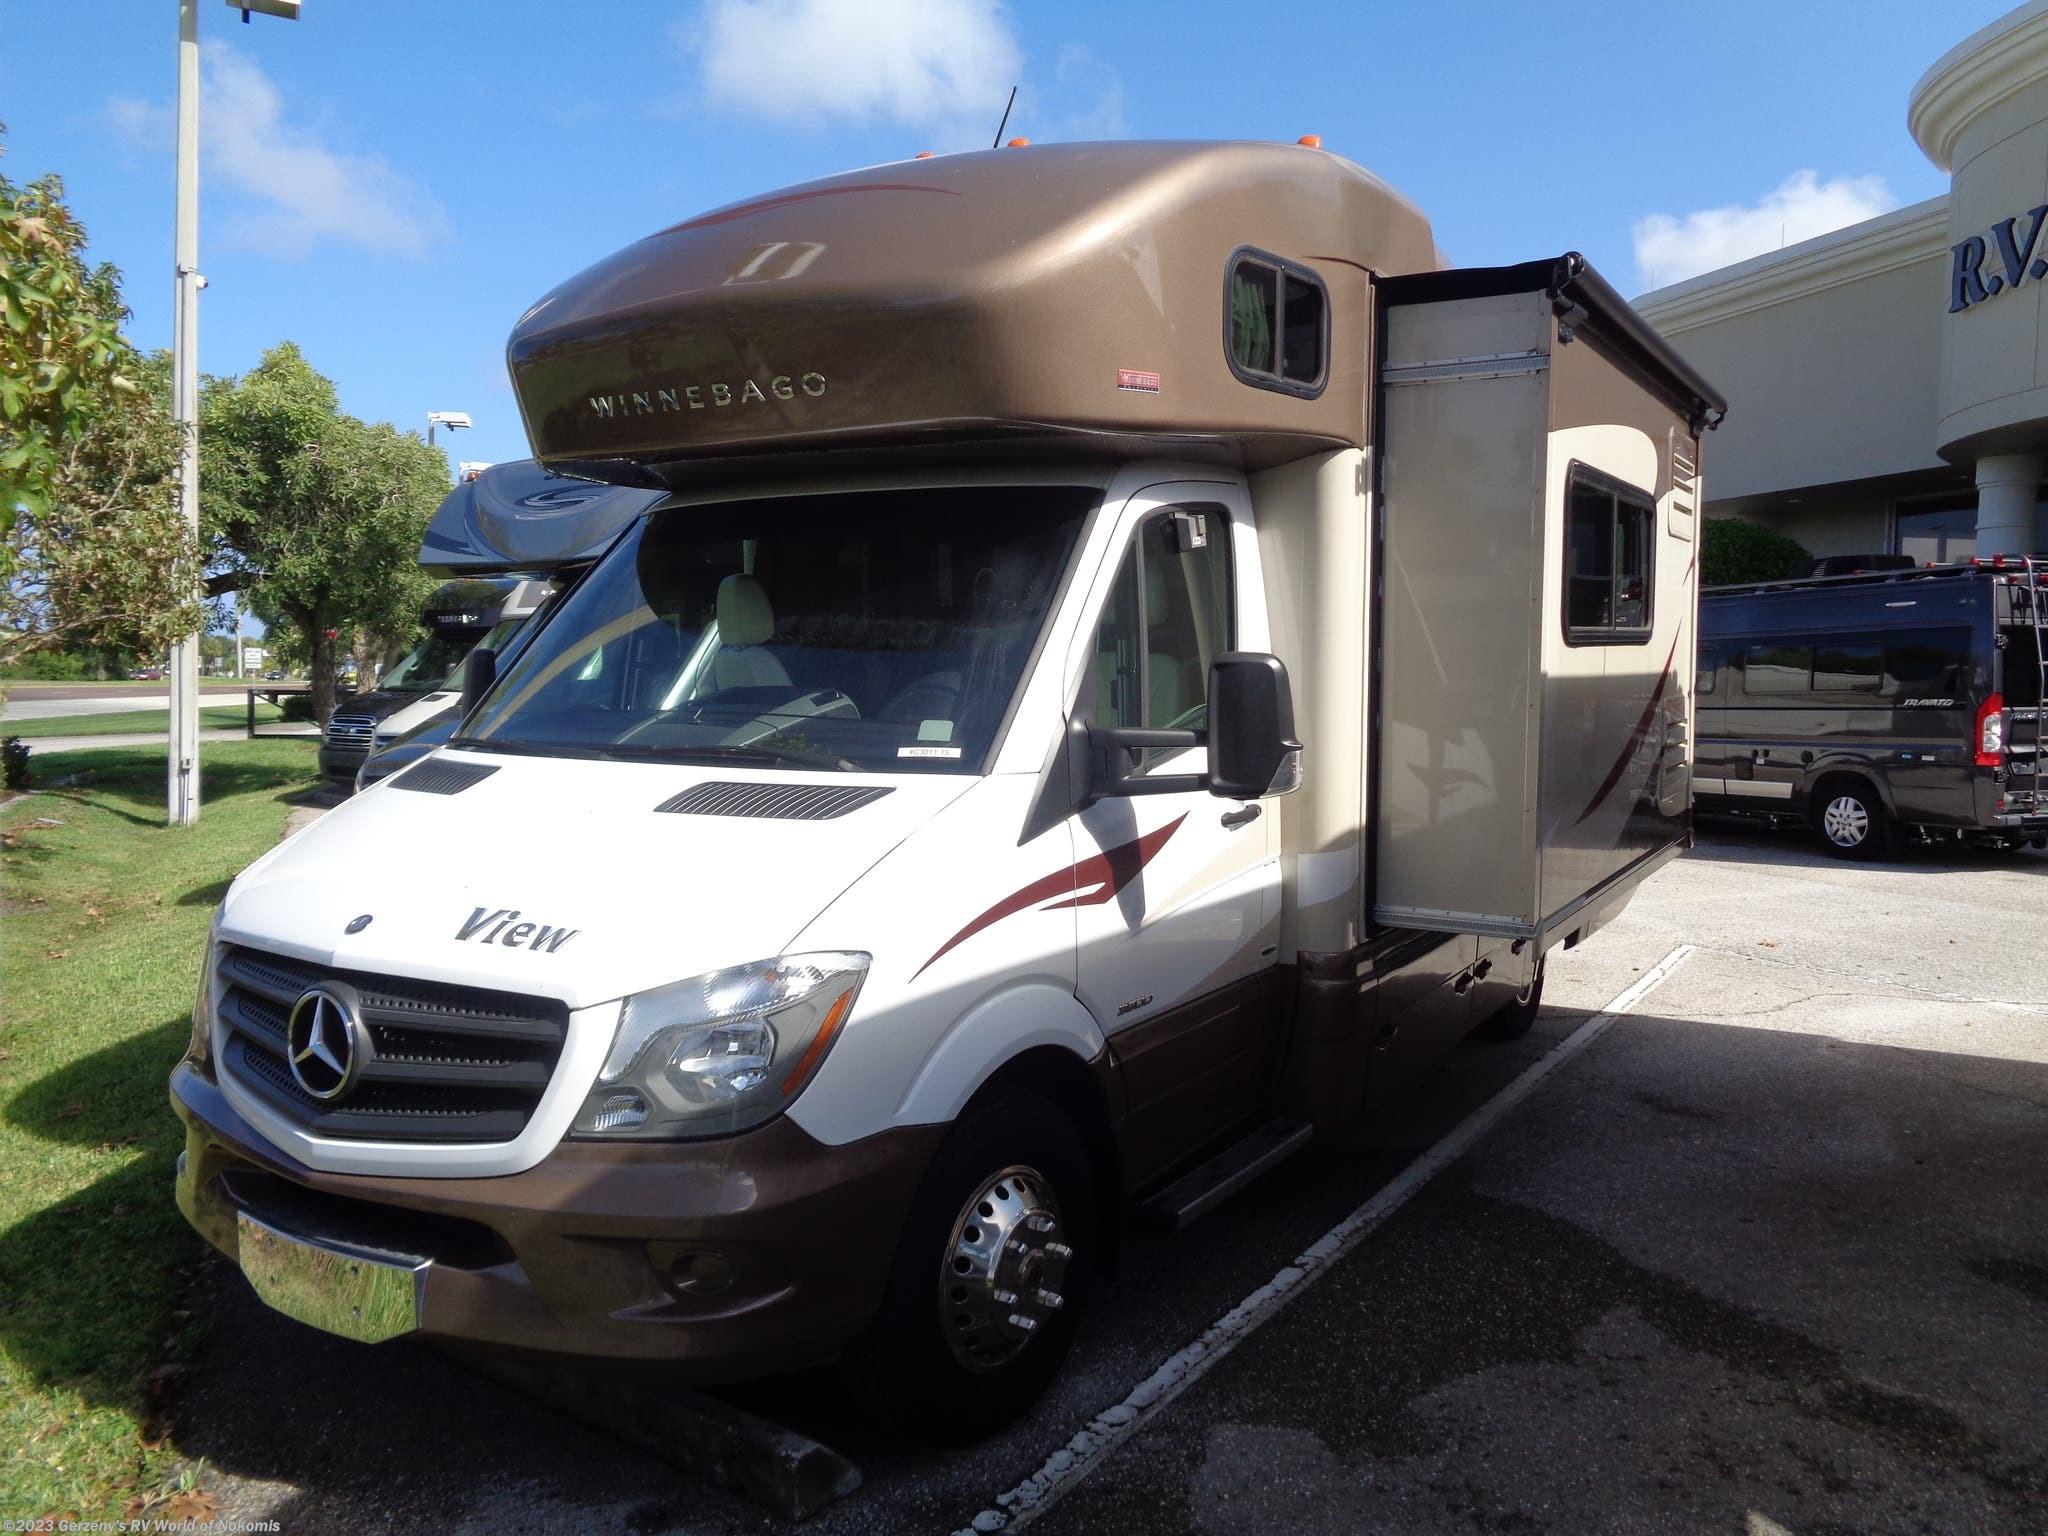 2015 Winnebago RV View 24 J for Sale in Nokomis, FL 34275